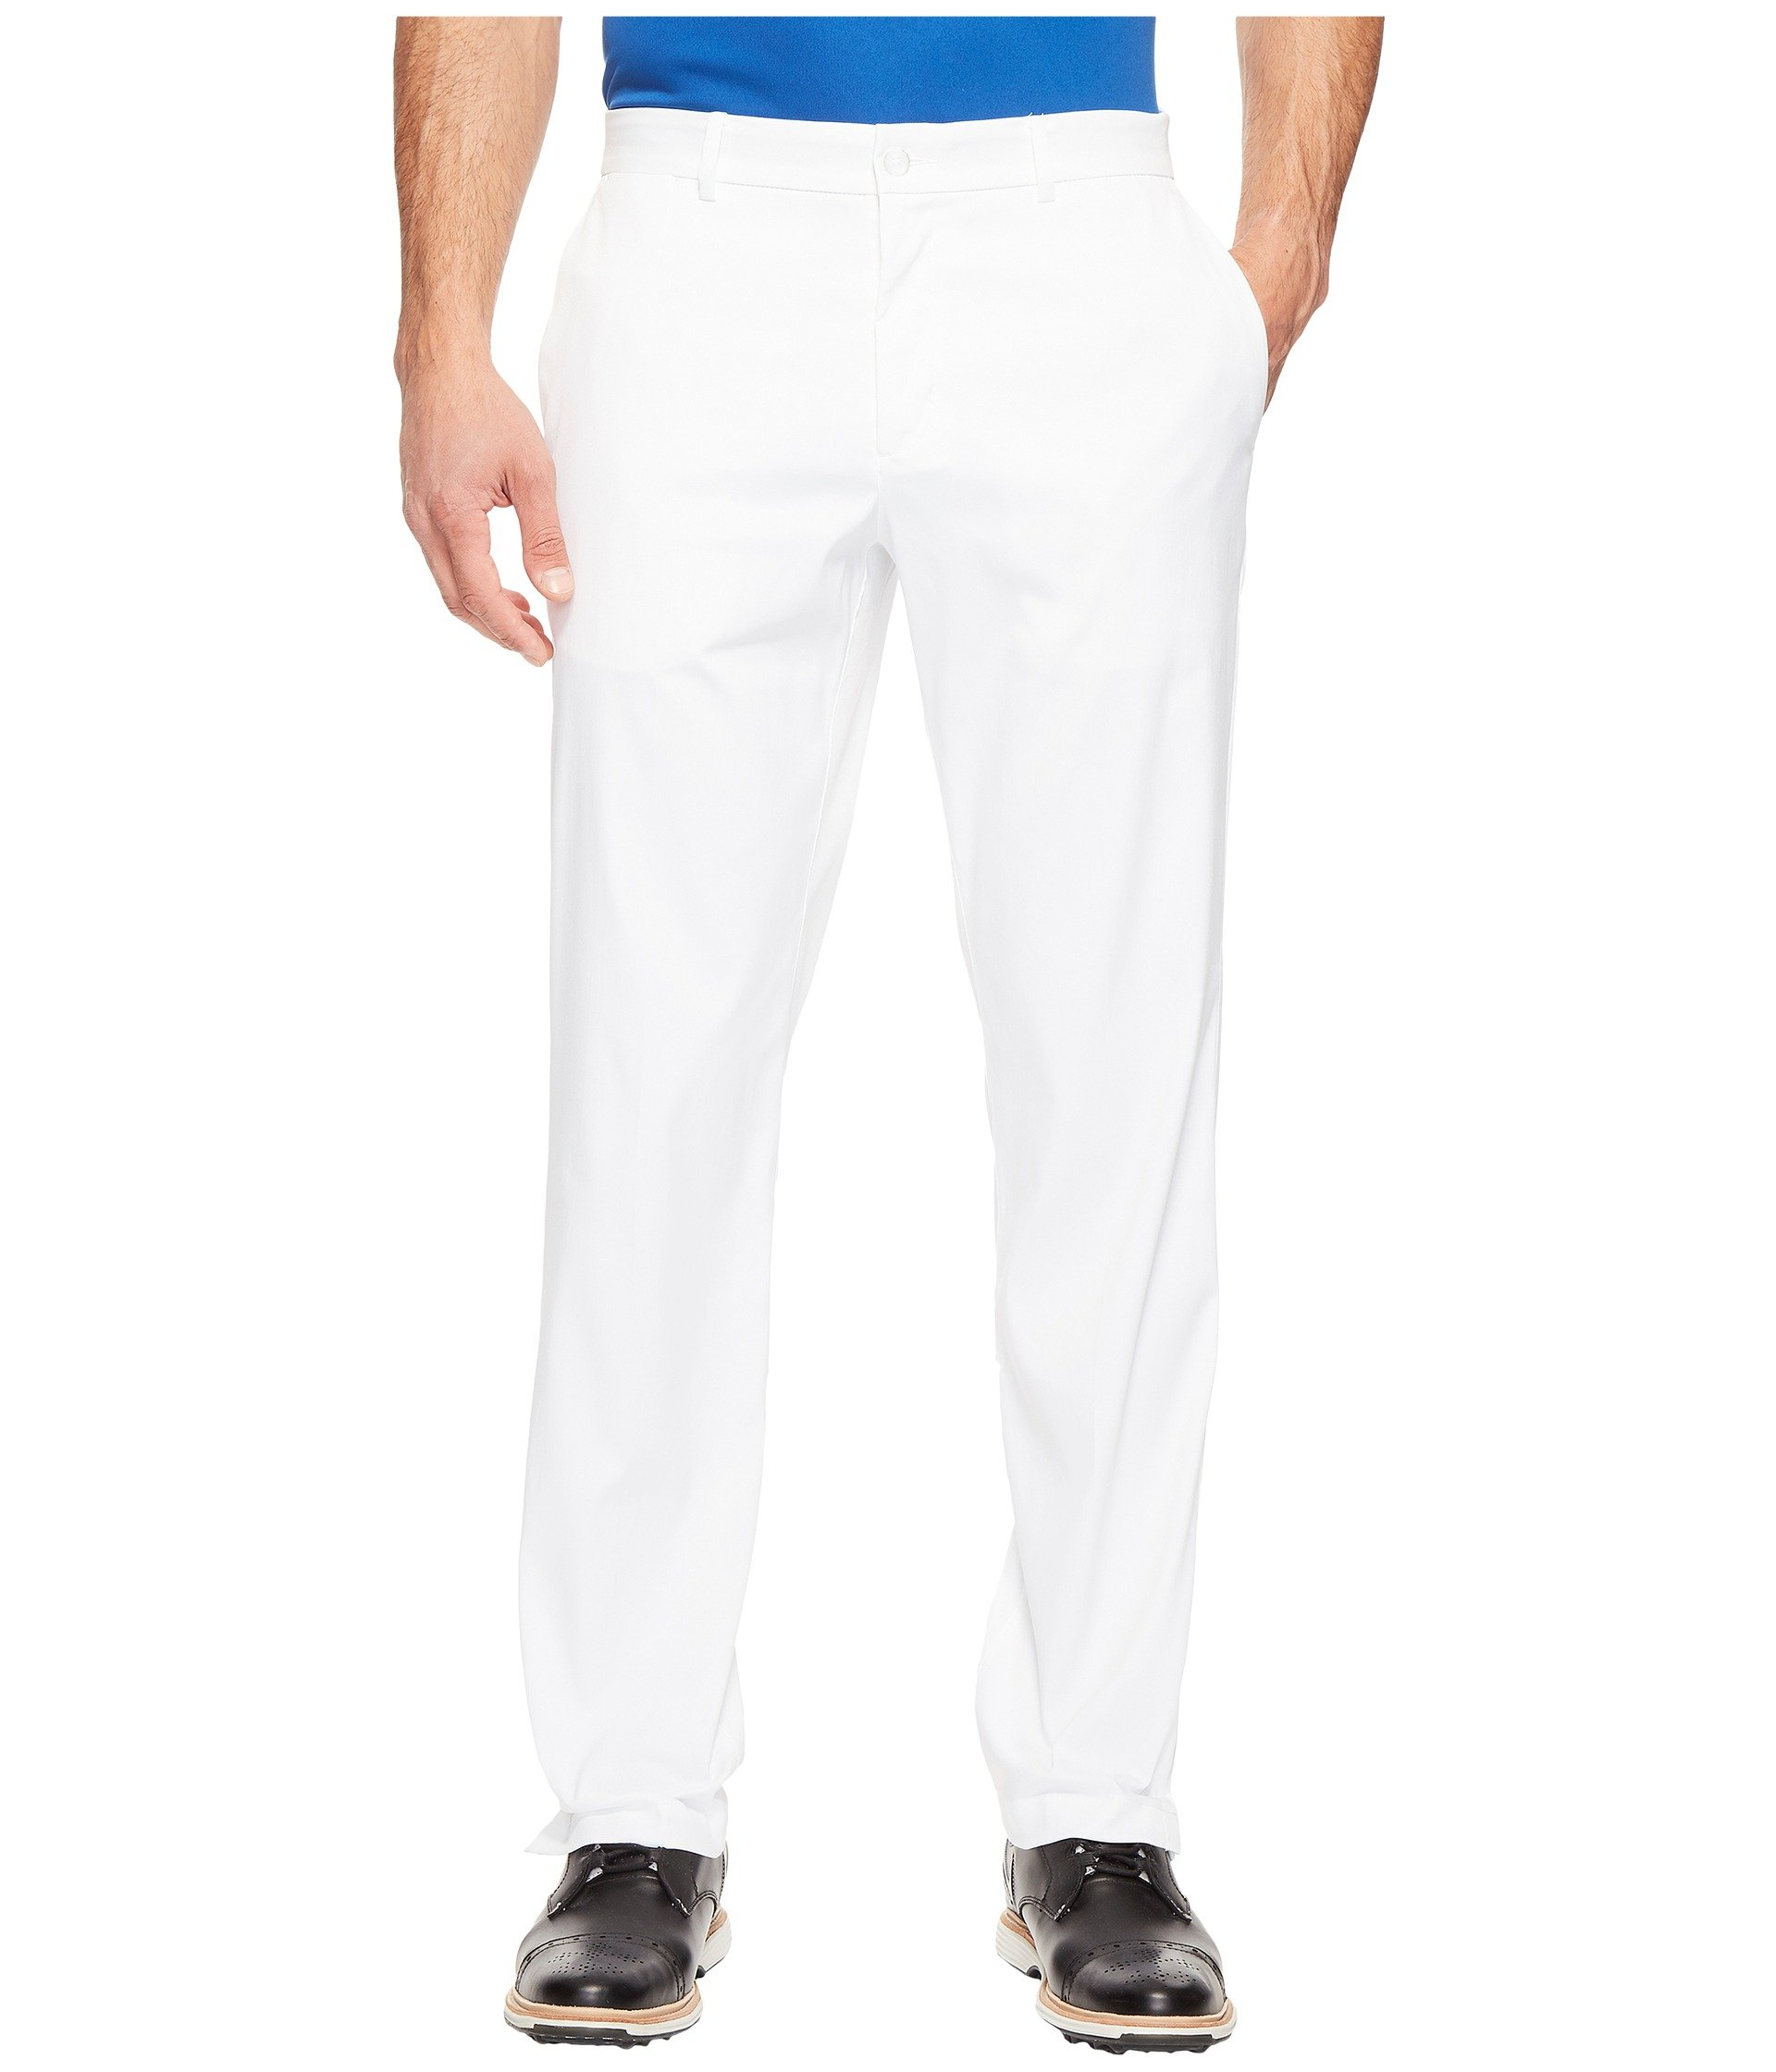 NIKE Men's Flat Front Golf Pants, White/White, Size 28/30